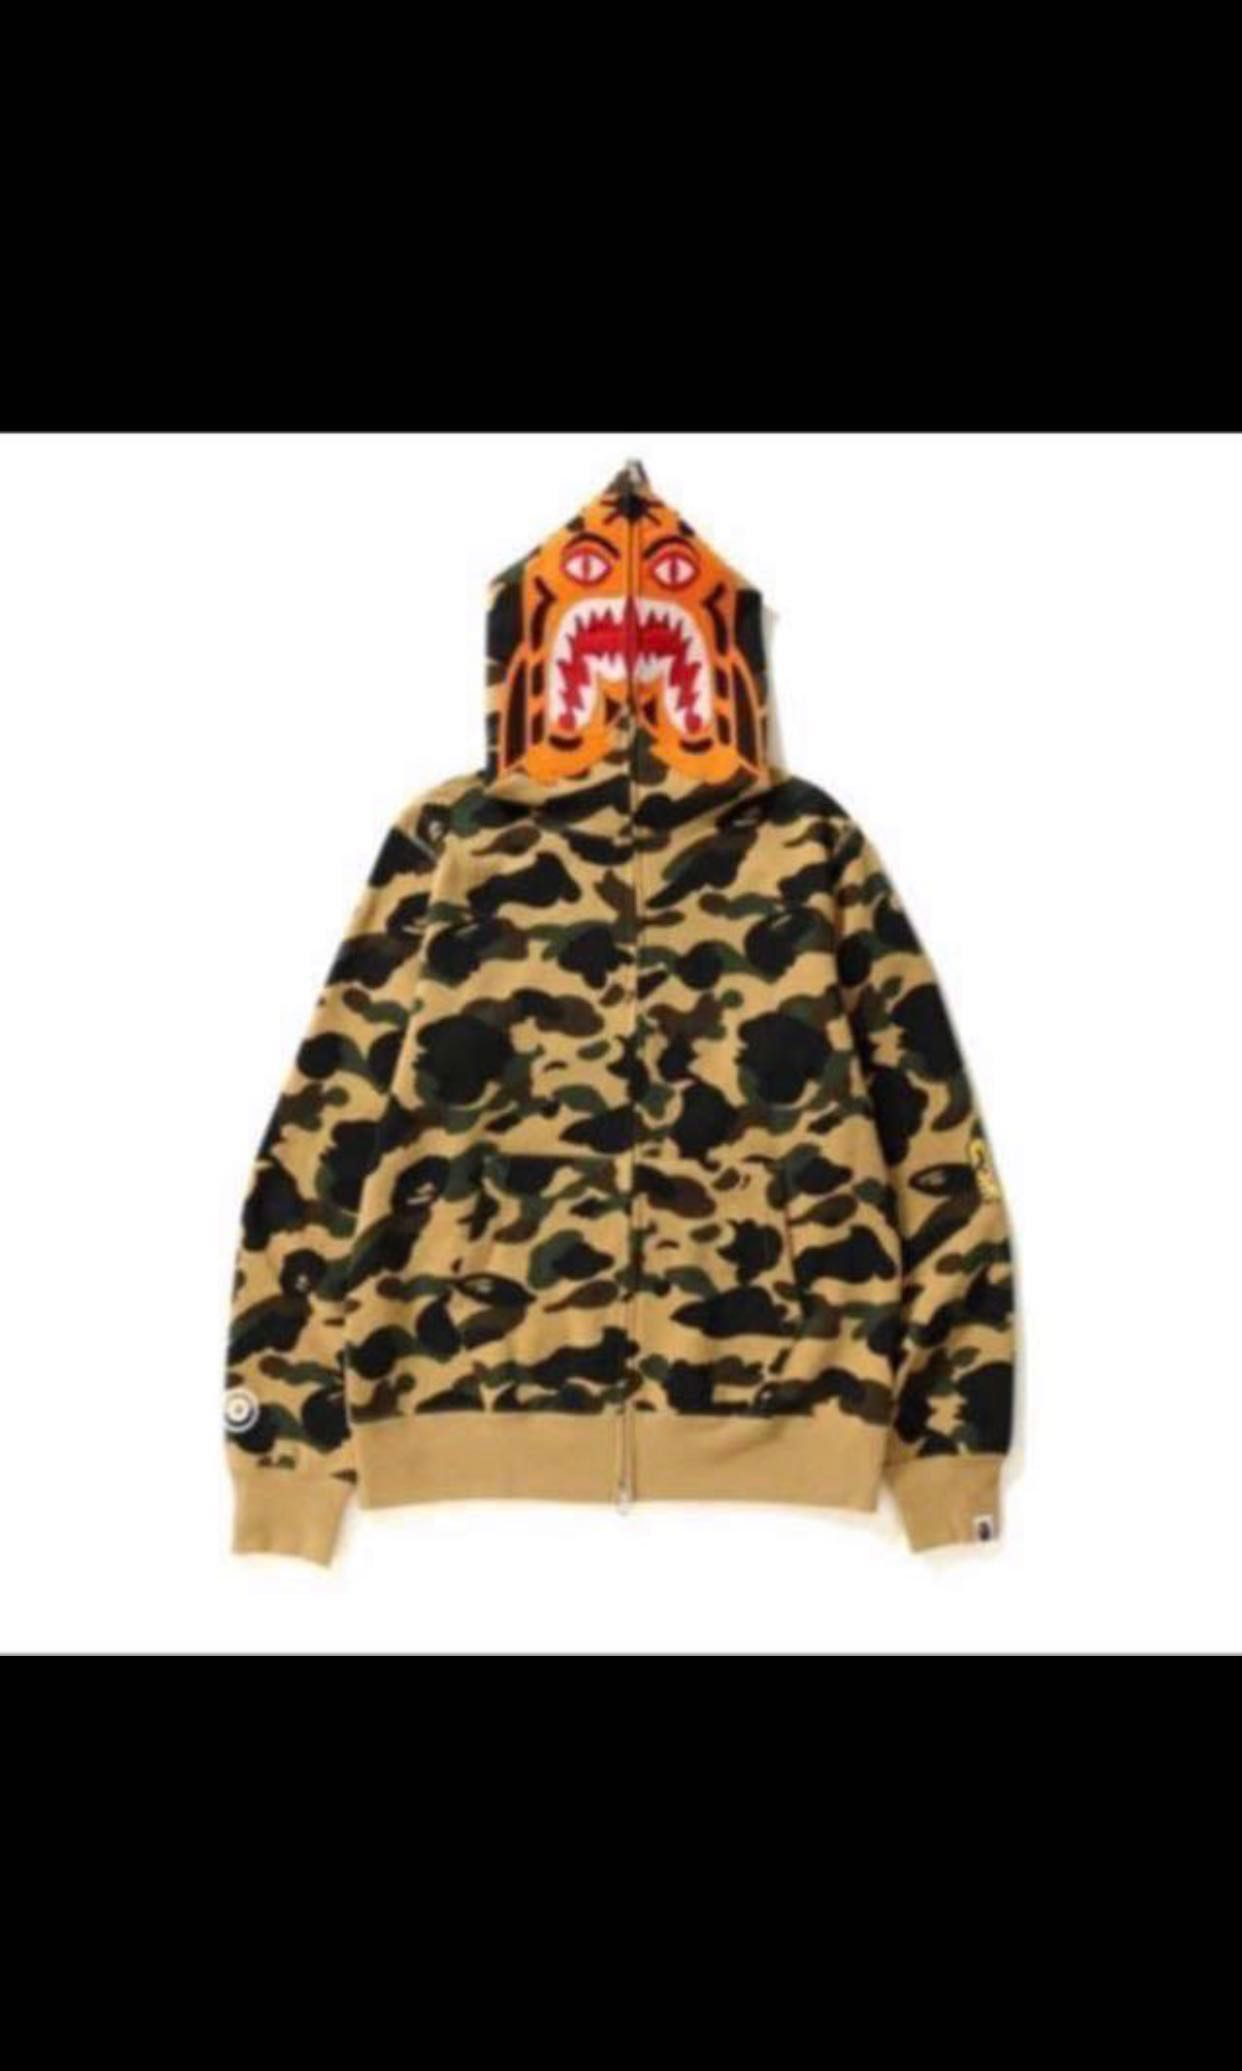 529523410d7 Bape Tiger Full Zip Hoodie (S